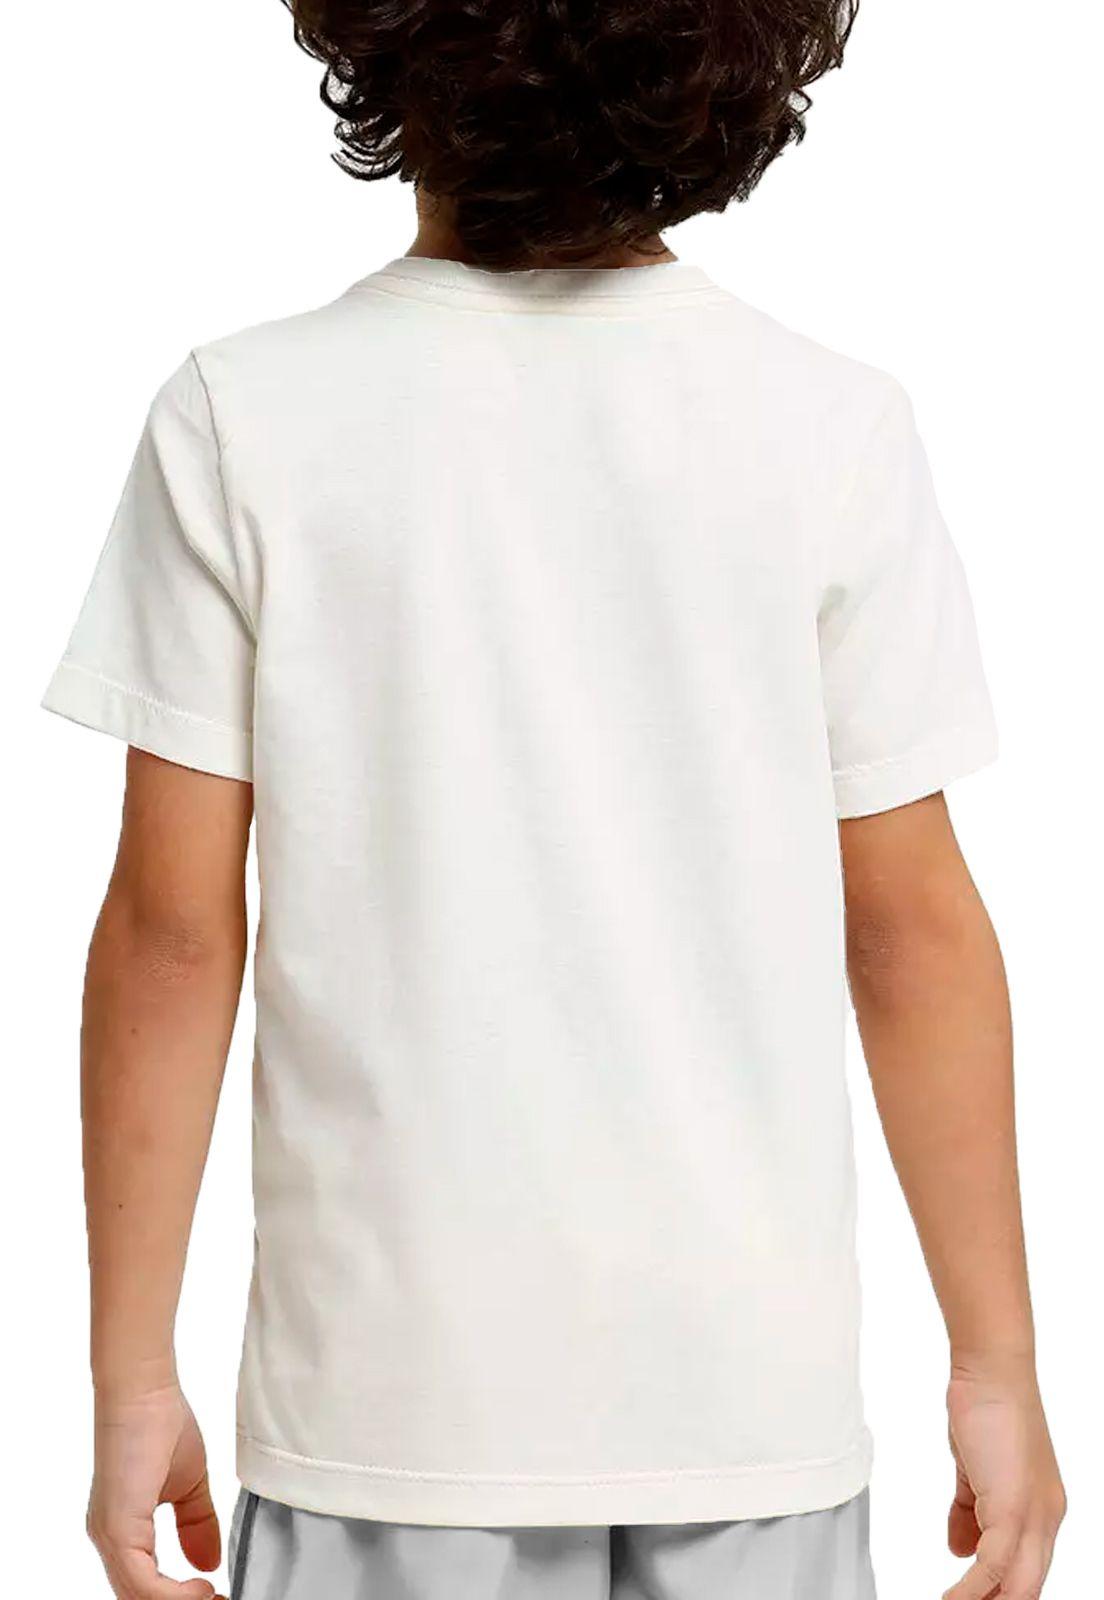 Camiseta Amazônia Adolescente Básica - Branco